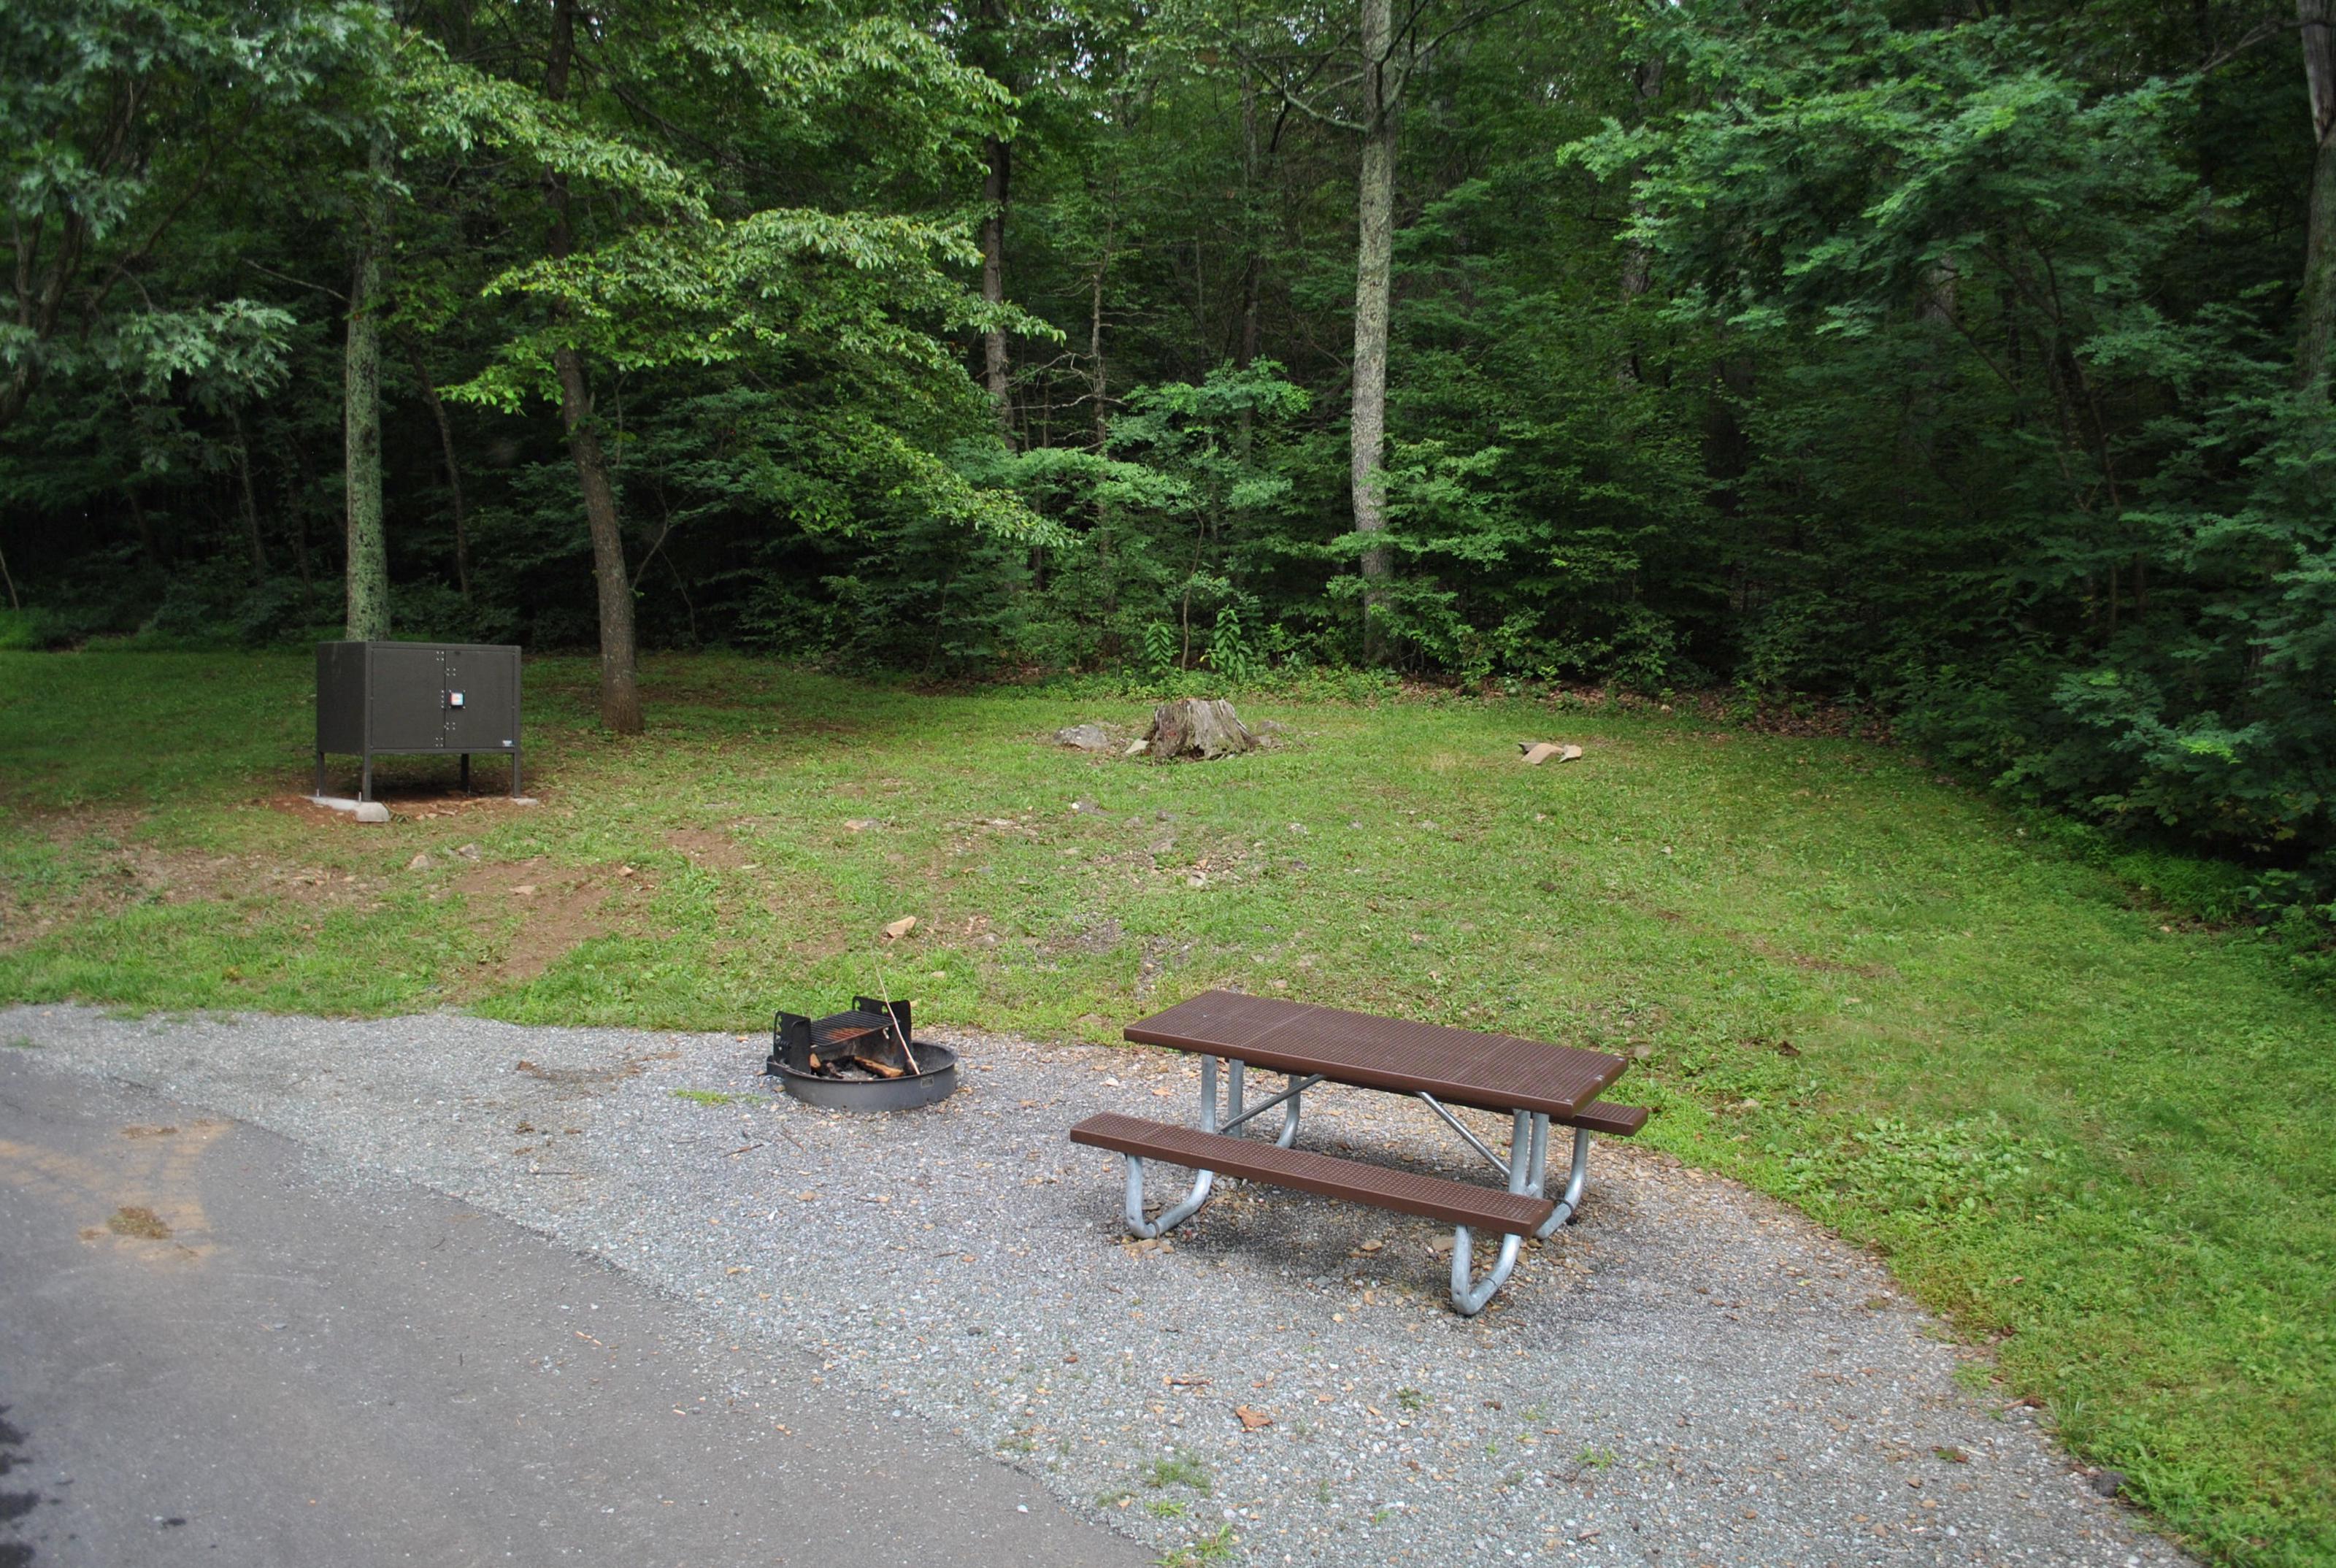 Mathews Arm Campground – Site A037